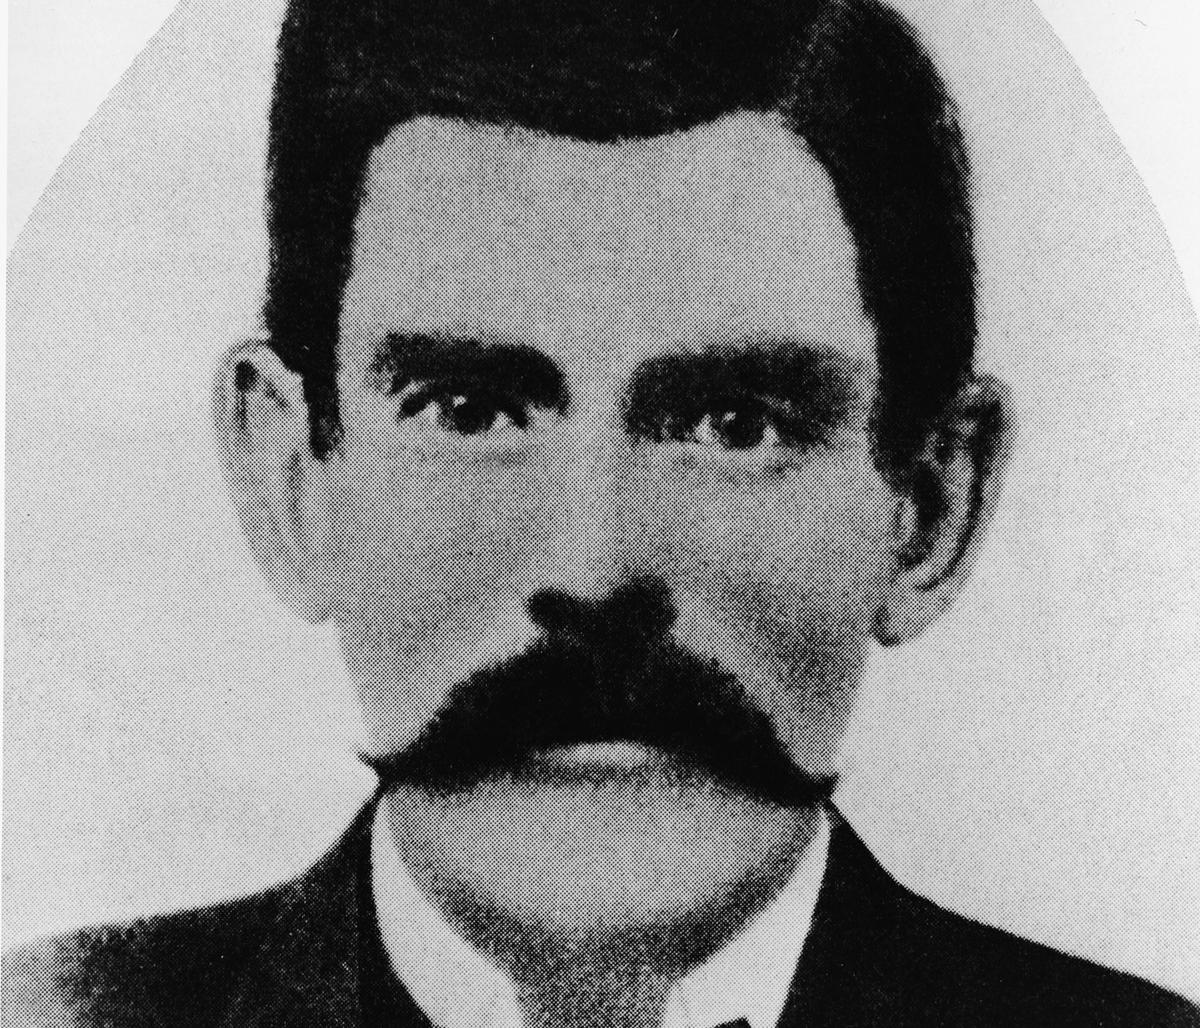 Portrait of American dentist, gambler and gunslinger